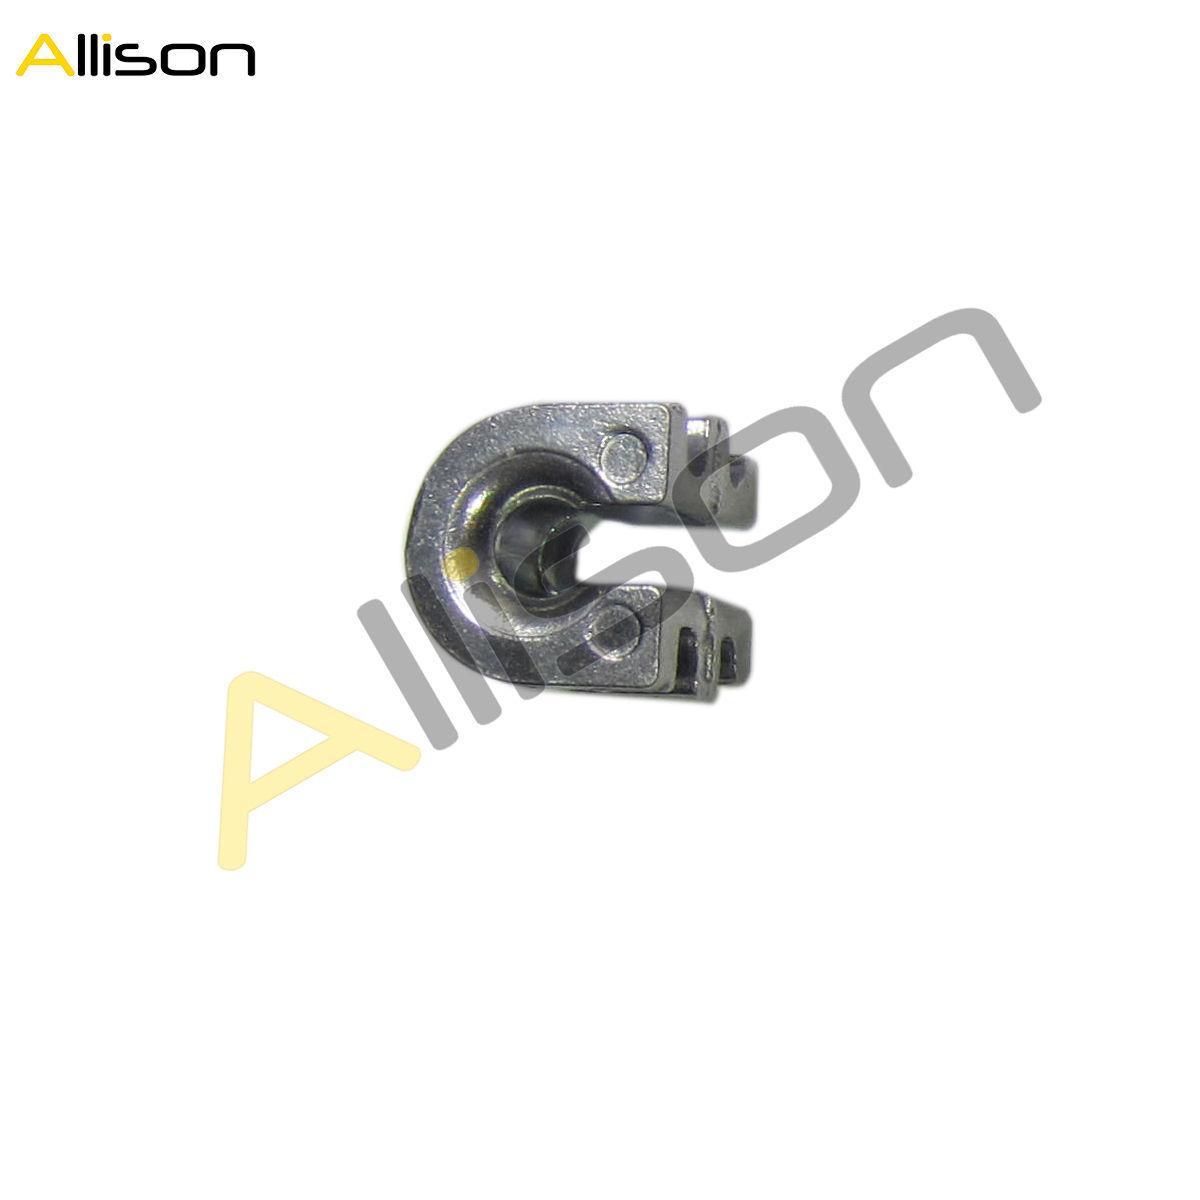 12X Trimmer Head Eyelet for STIHL FS100 FS44 FS-55 FS80 FS88 FS90 FS120 FS106